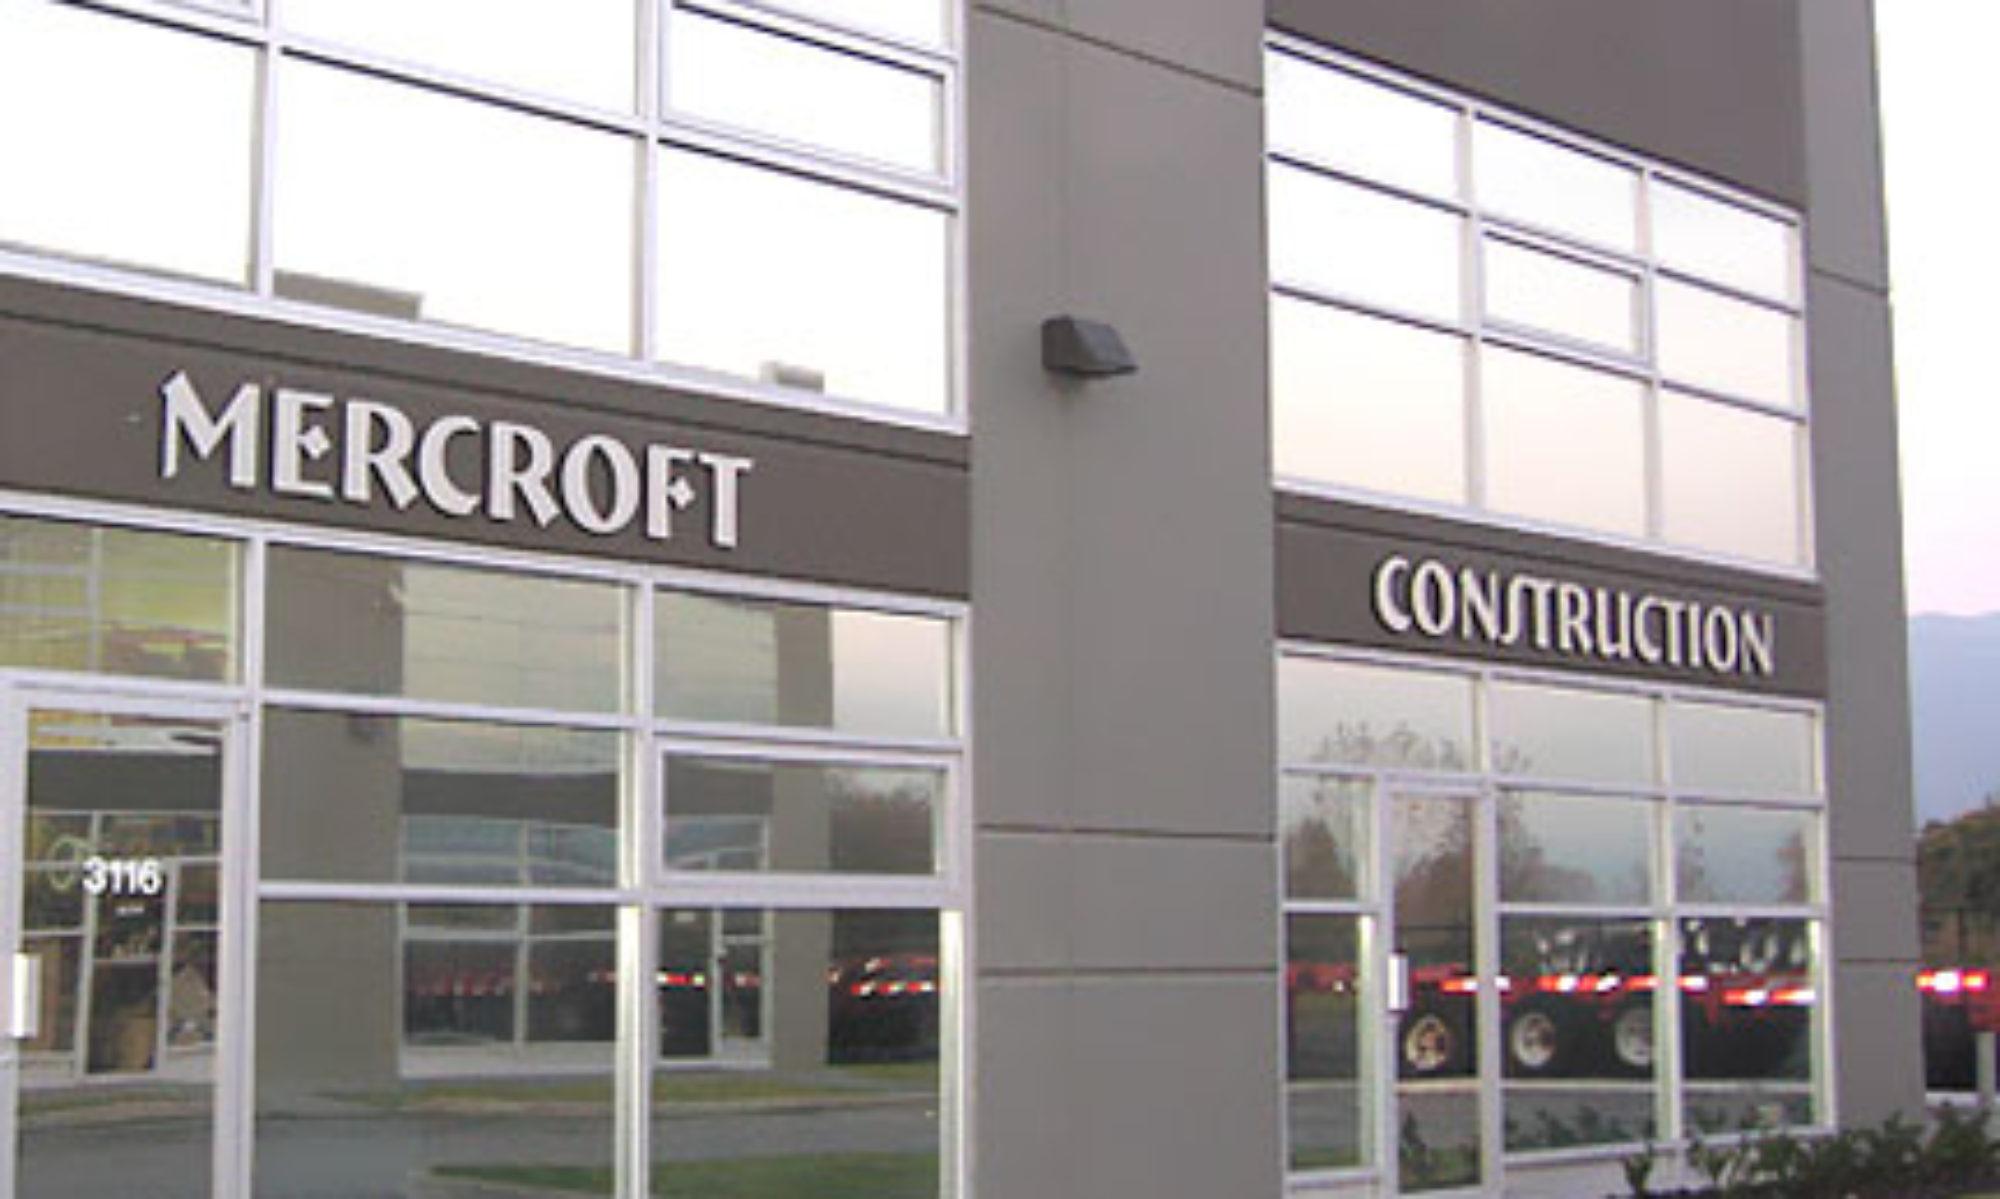 Mercroft